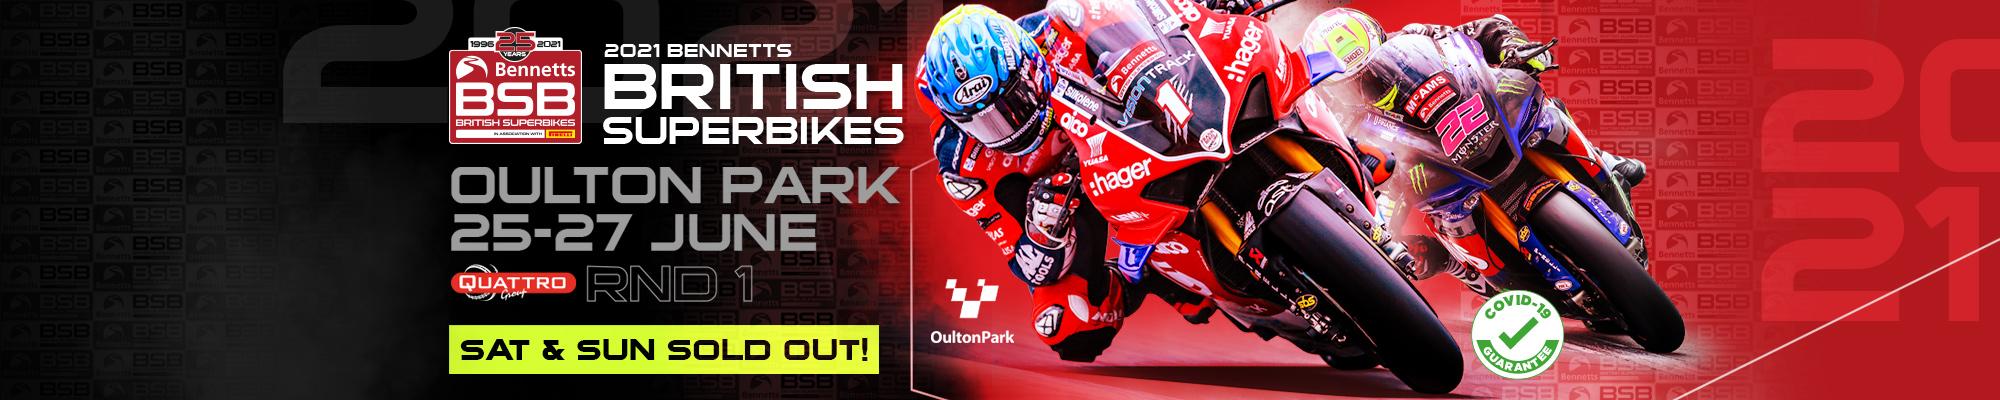 Bennetts British Superbike Championship